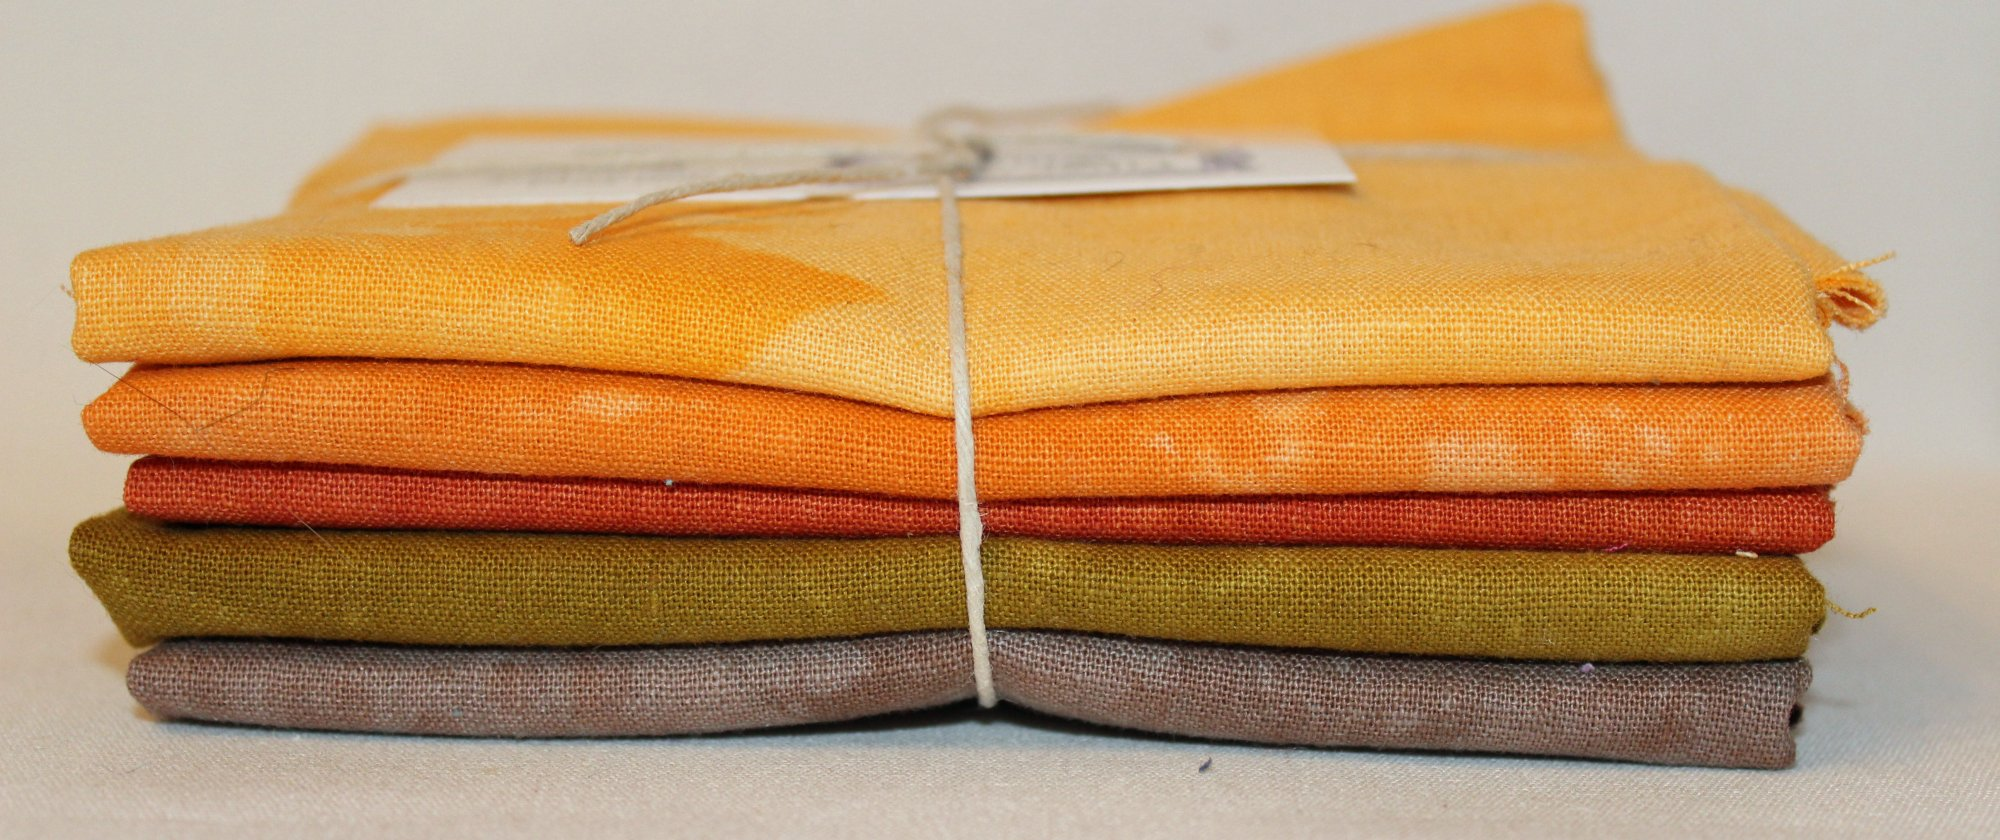 Rustic Hand-dyed Linen Fat Quarter 5pc Set